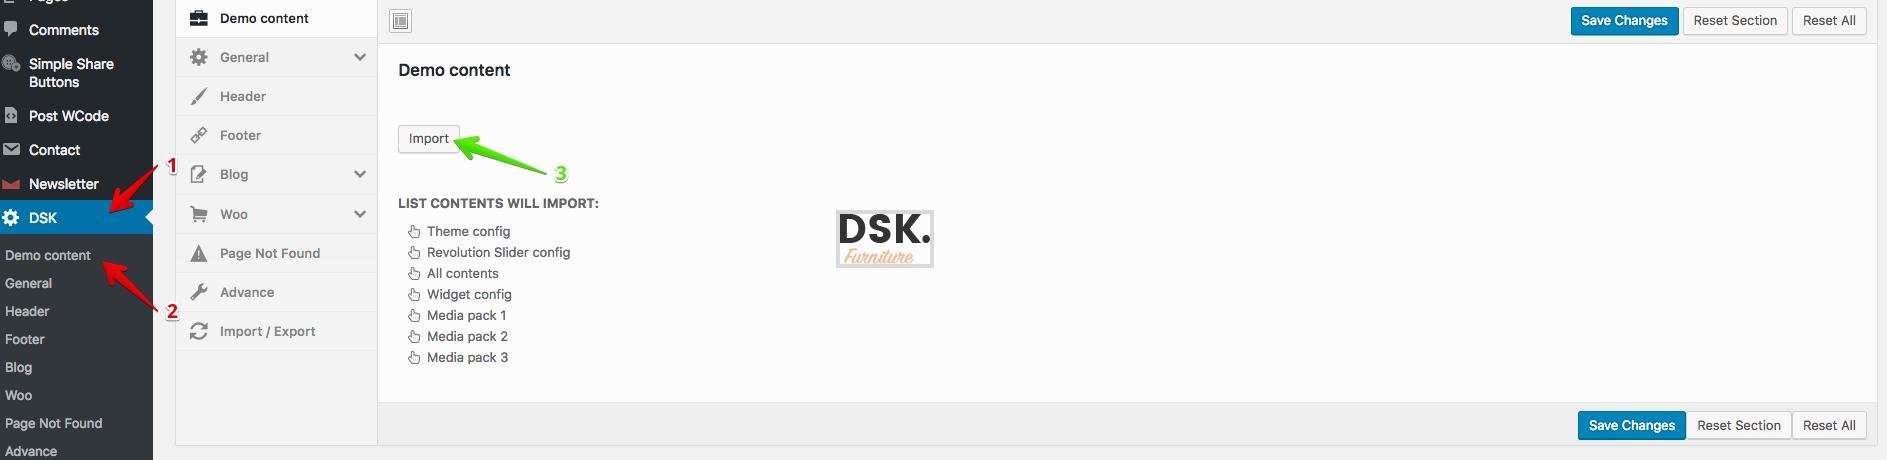 دانلود پوسته فروشگاهی مبلمان وردپرس DSK